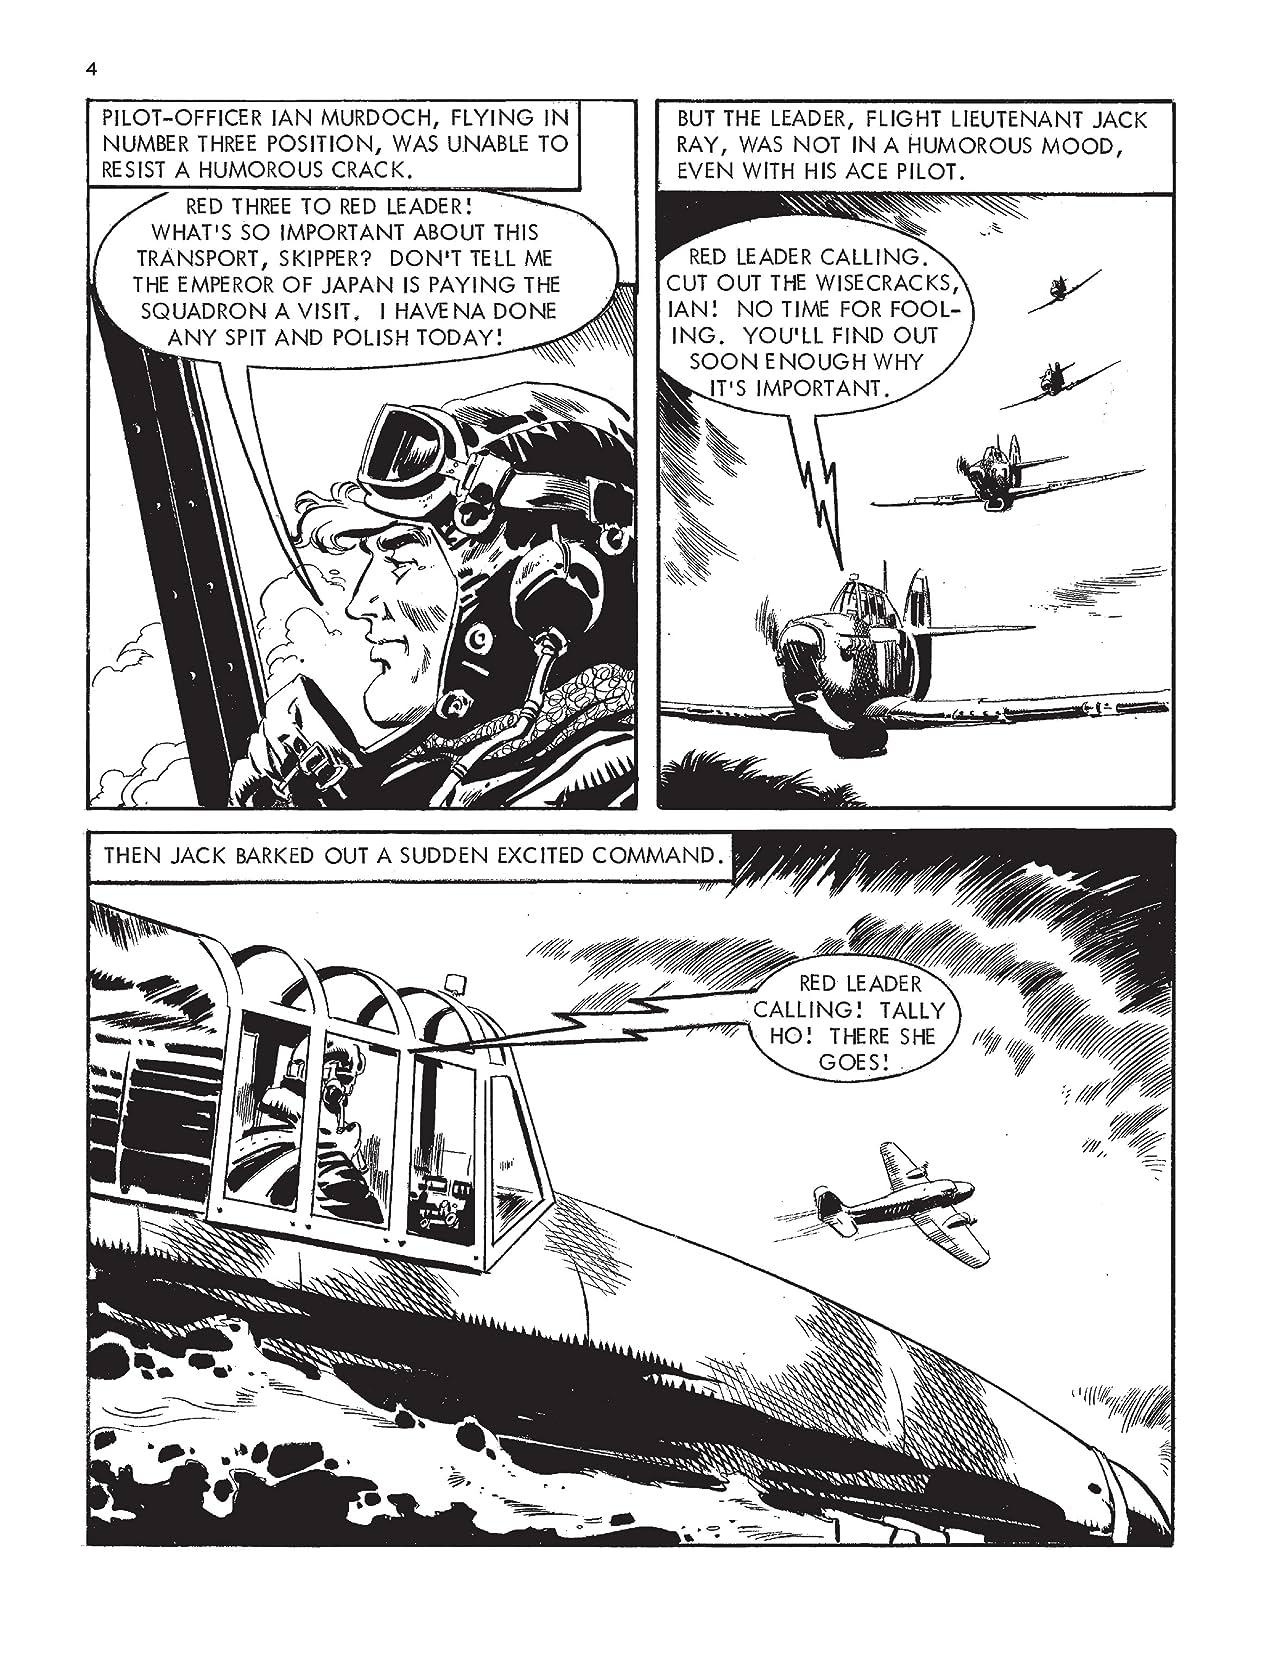 Commando #4844: Hurricane Ace